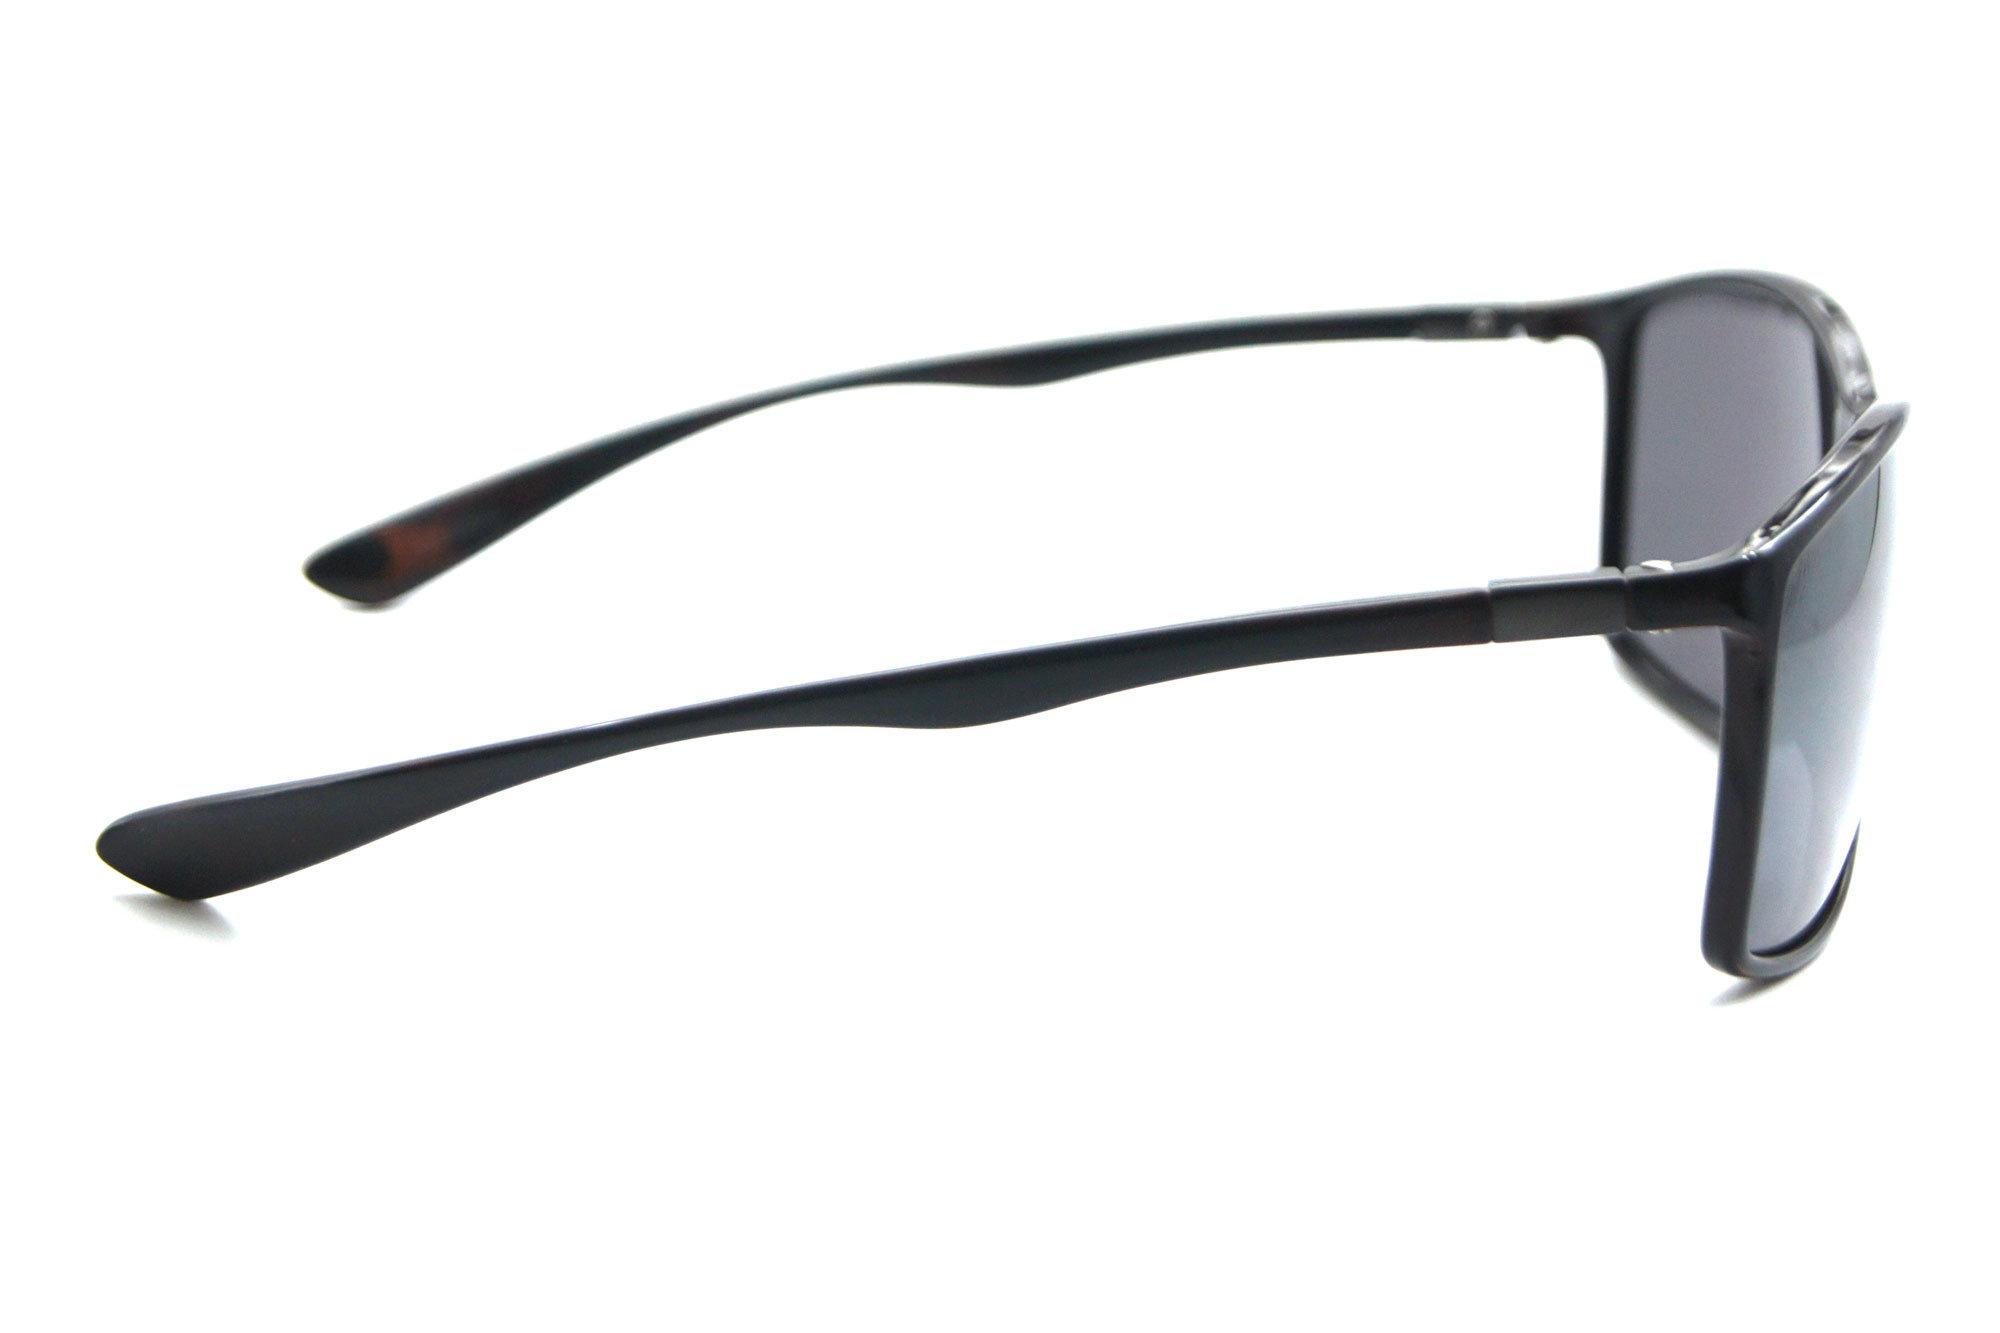 Hot Sell OEM Brand Designer Polarized Fashion Sunglasses for Man